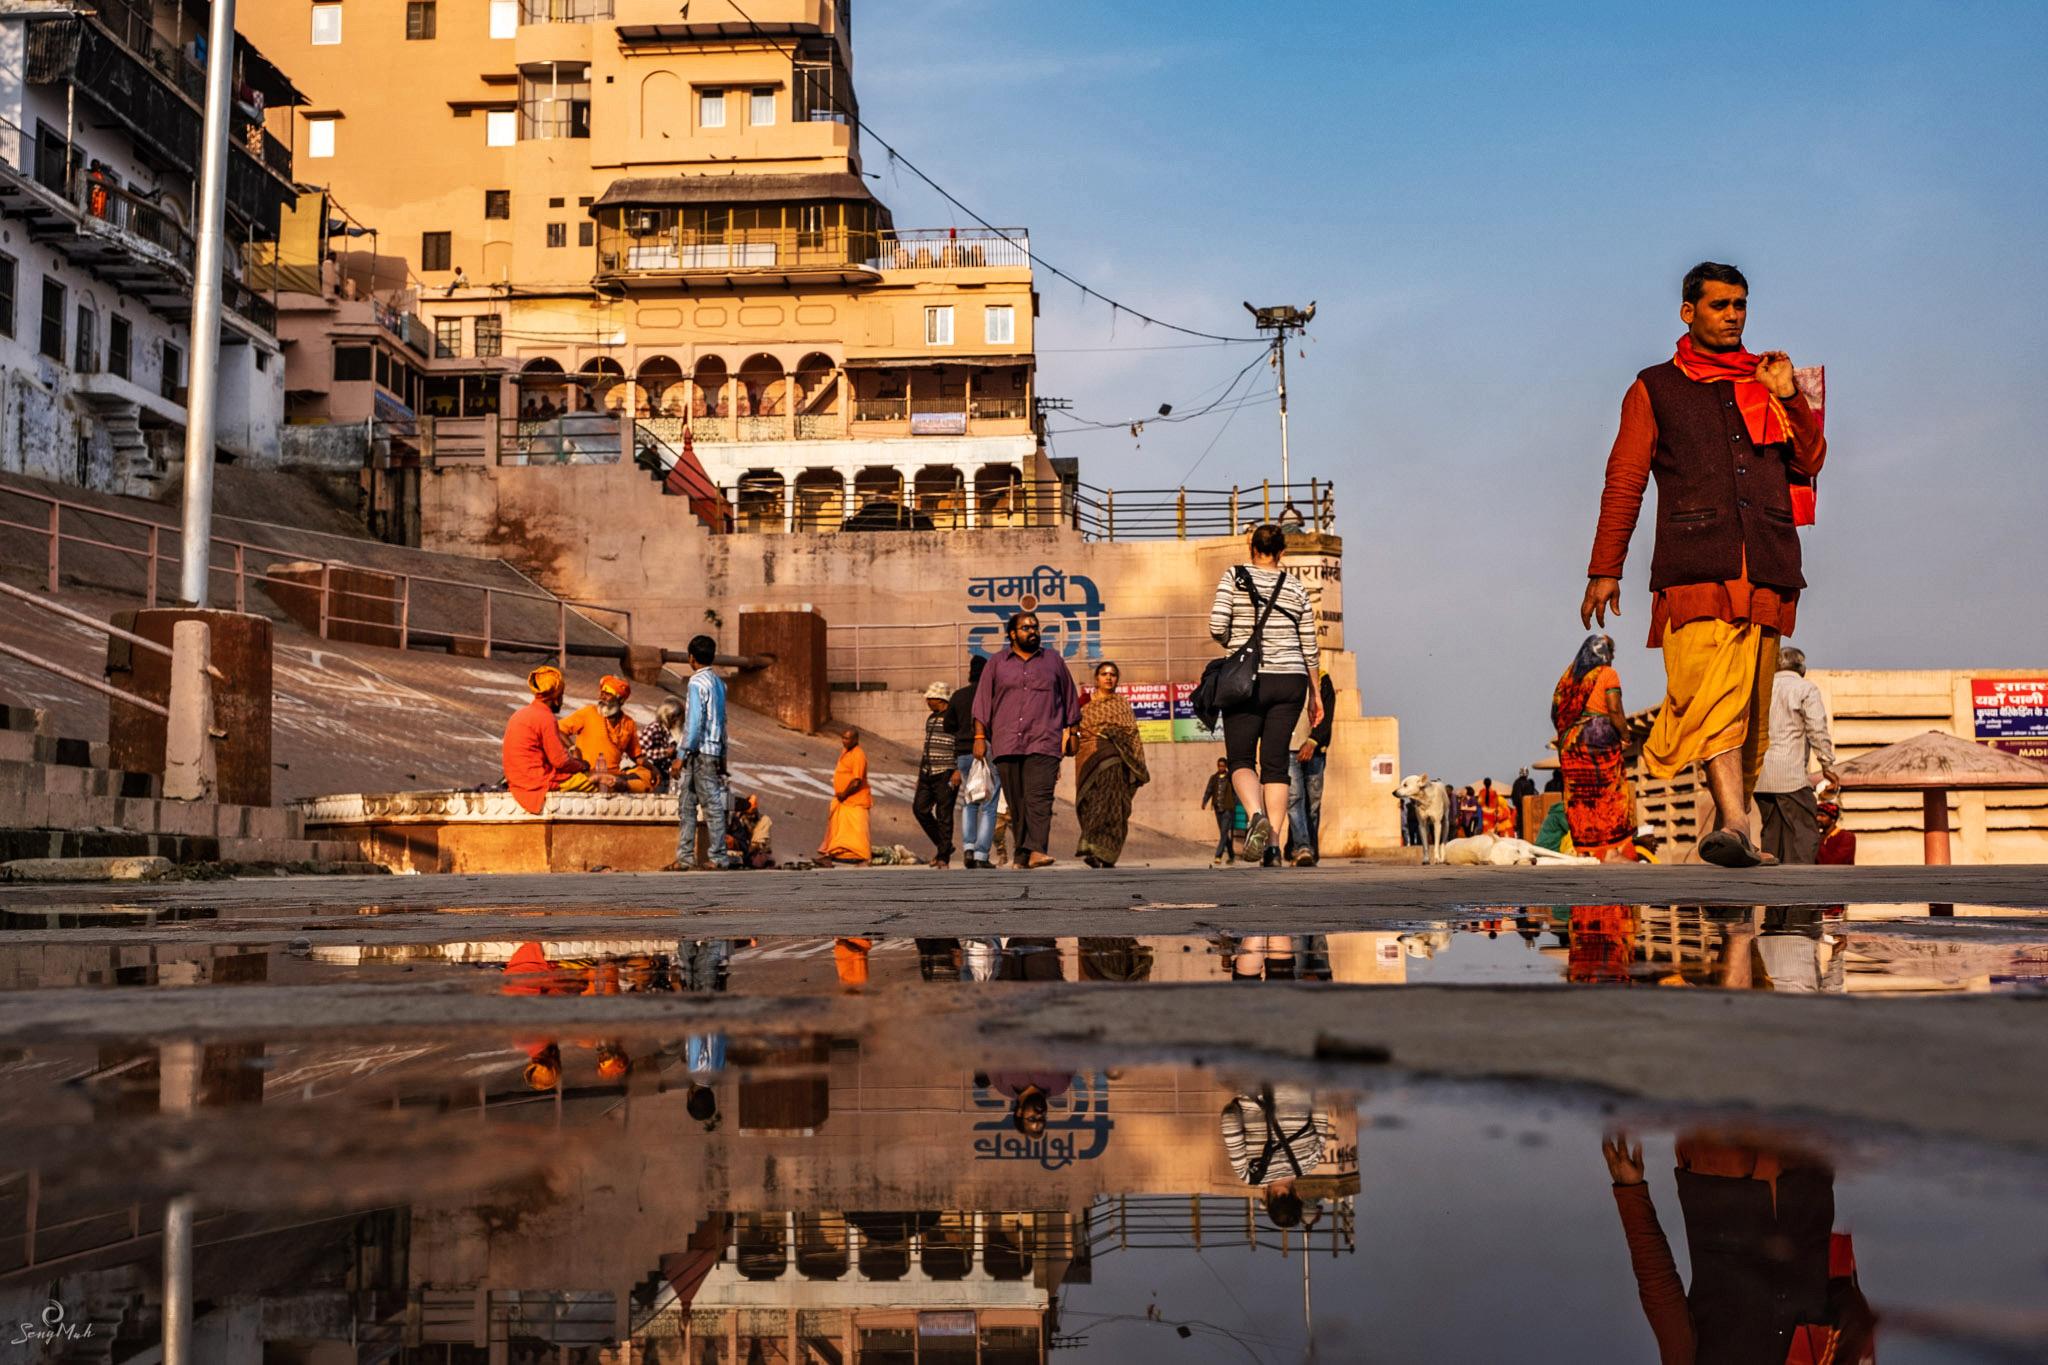 Varanasi reflections